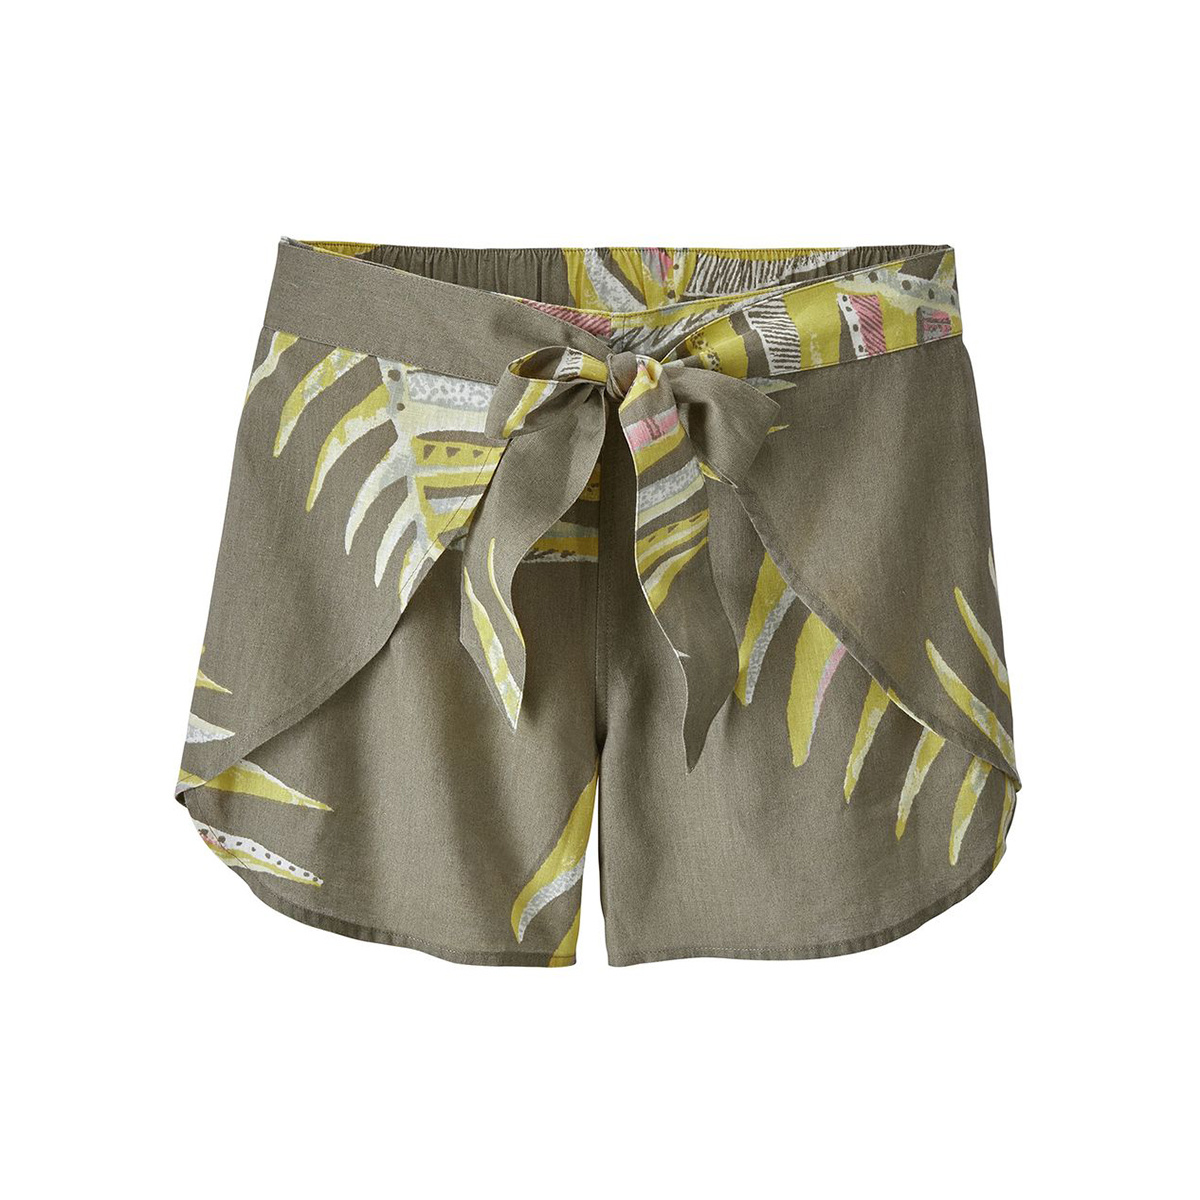 Patagonia Women's Garden Island Shorts